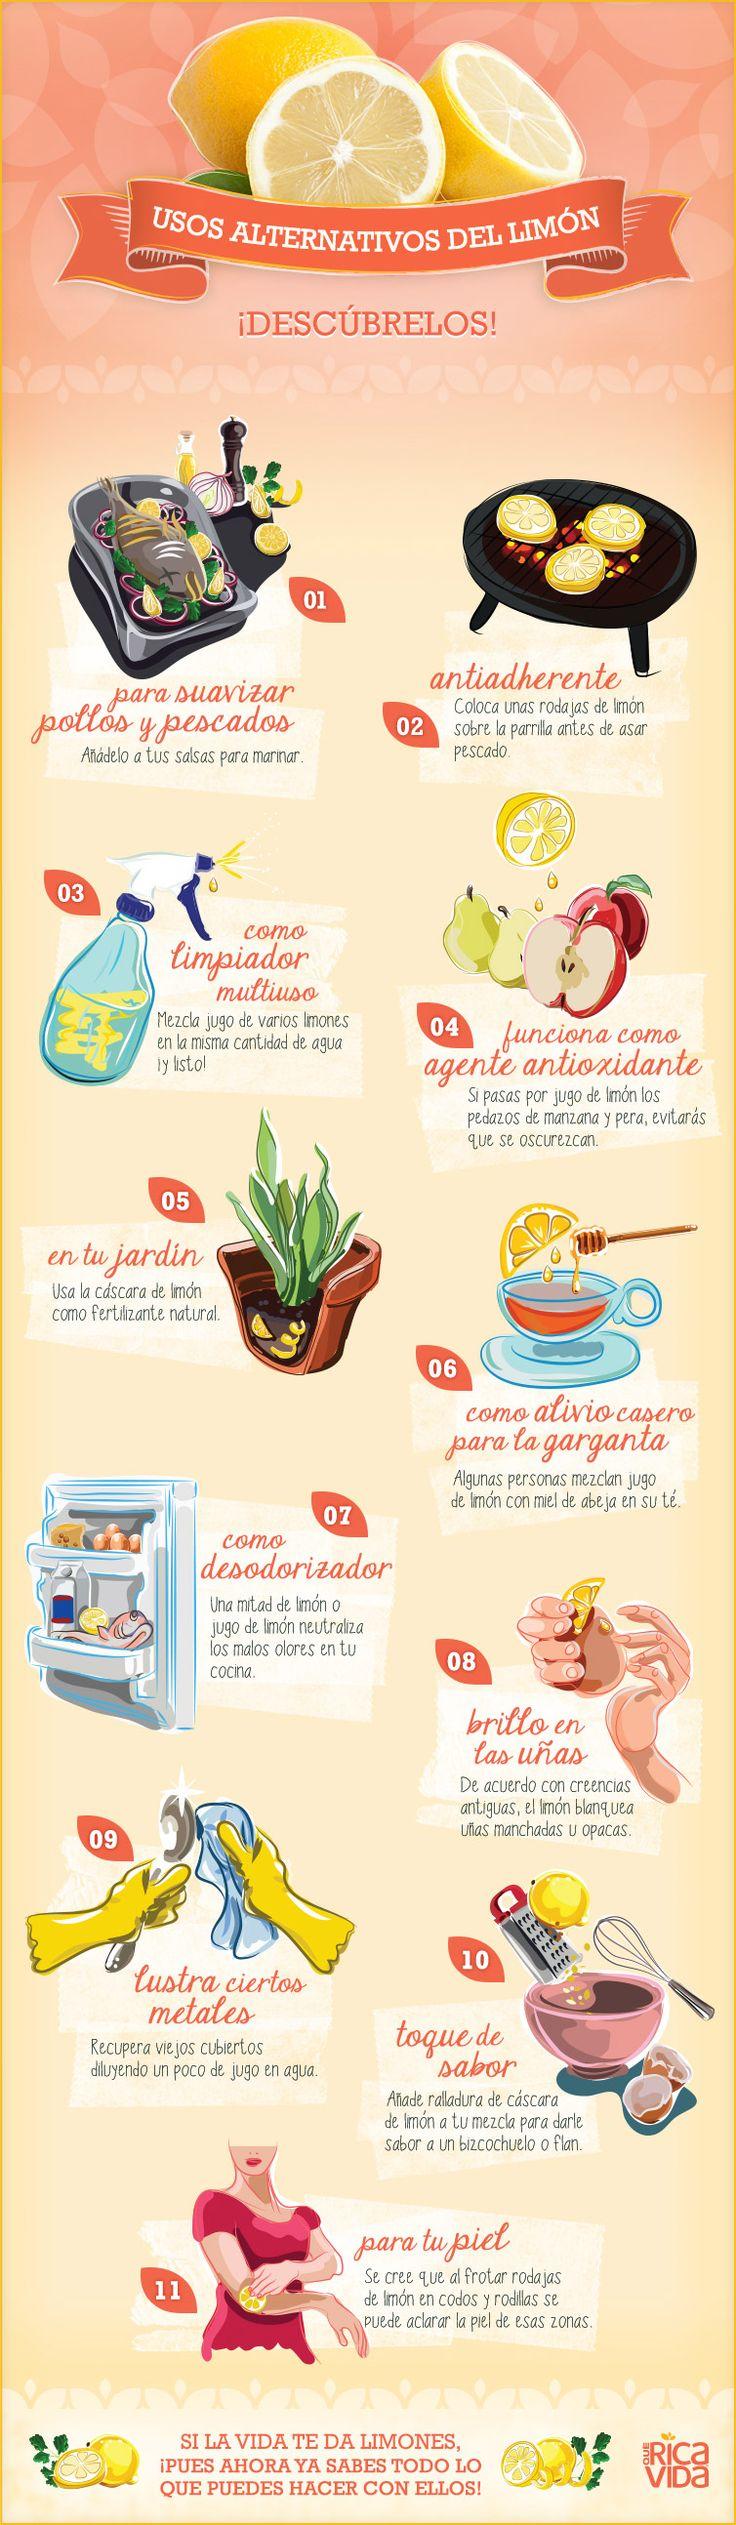 Si la Vida Te Da #Limones, Haz Mucho Más Que Limonada #Infographia